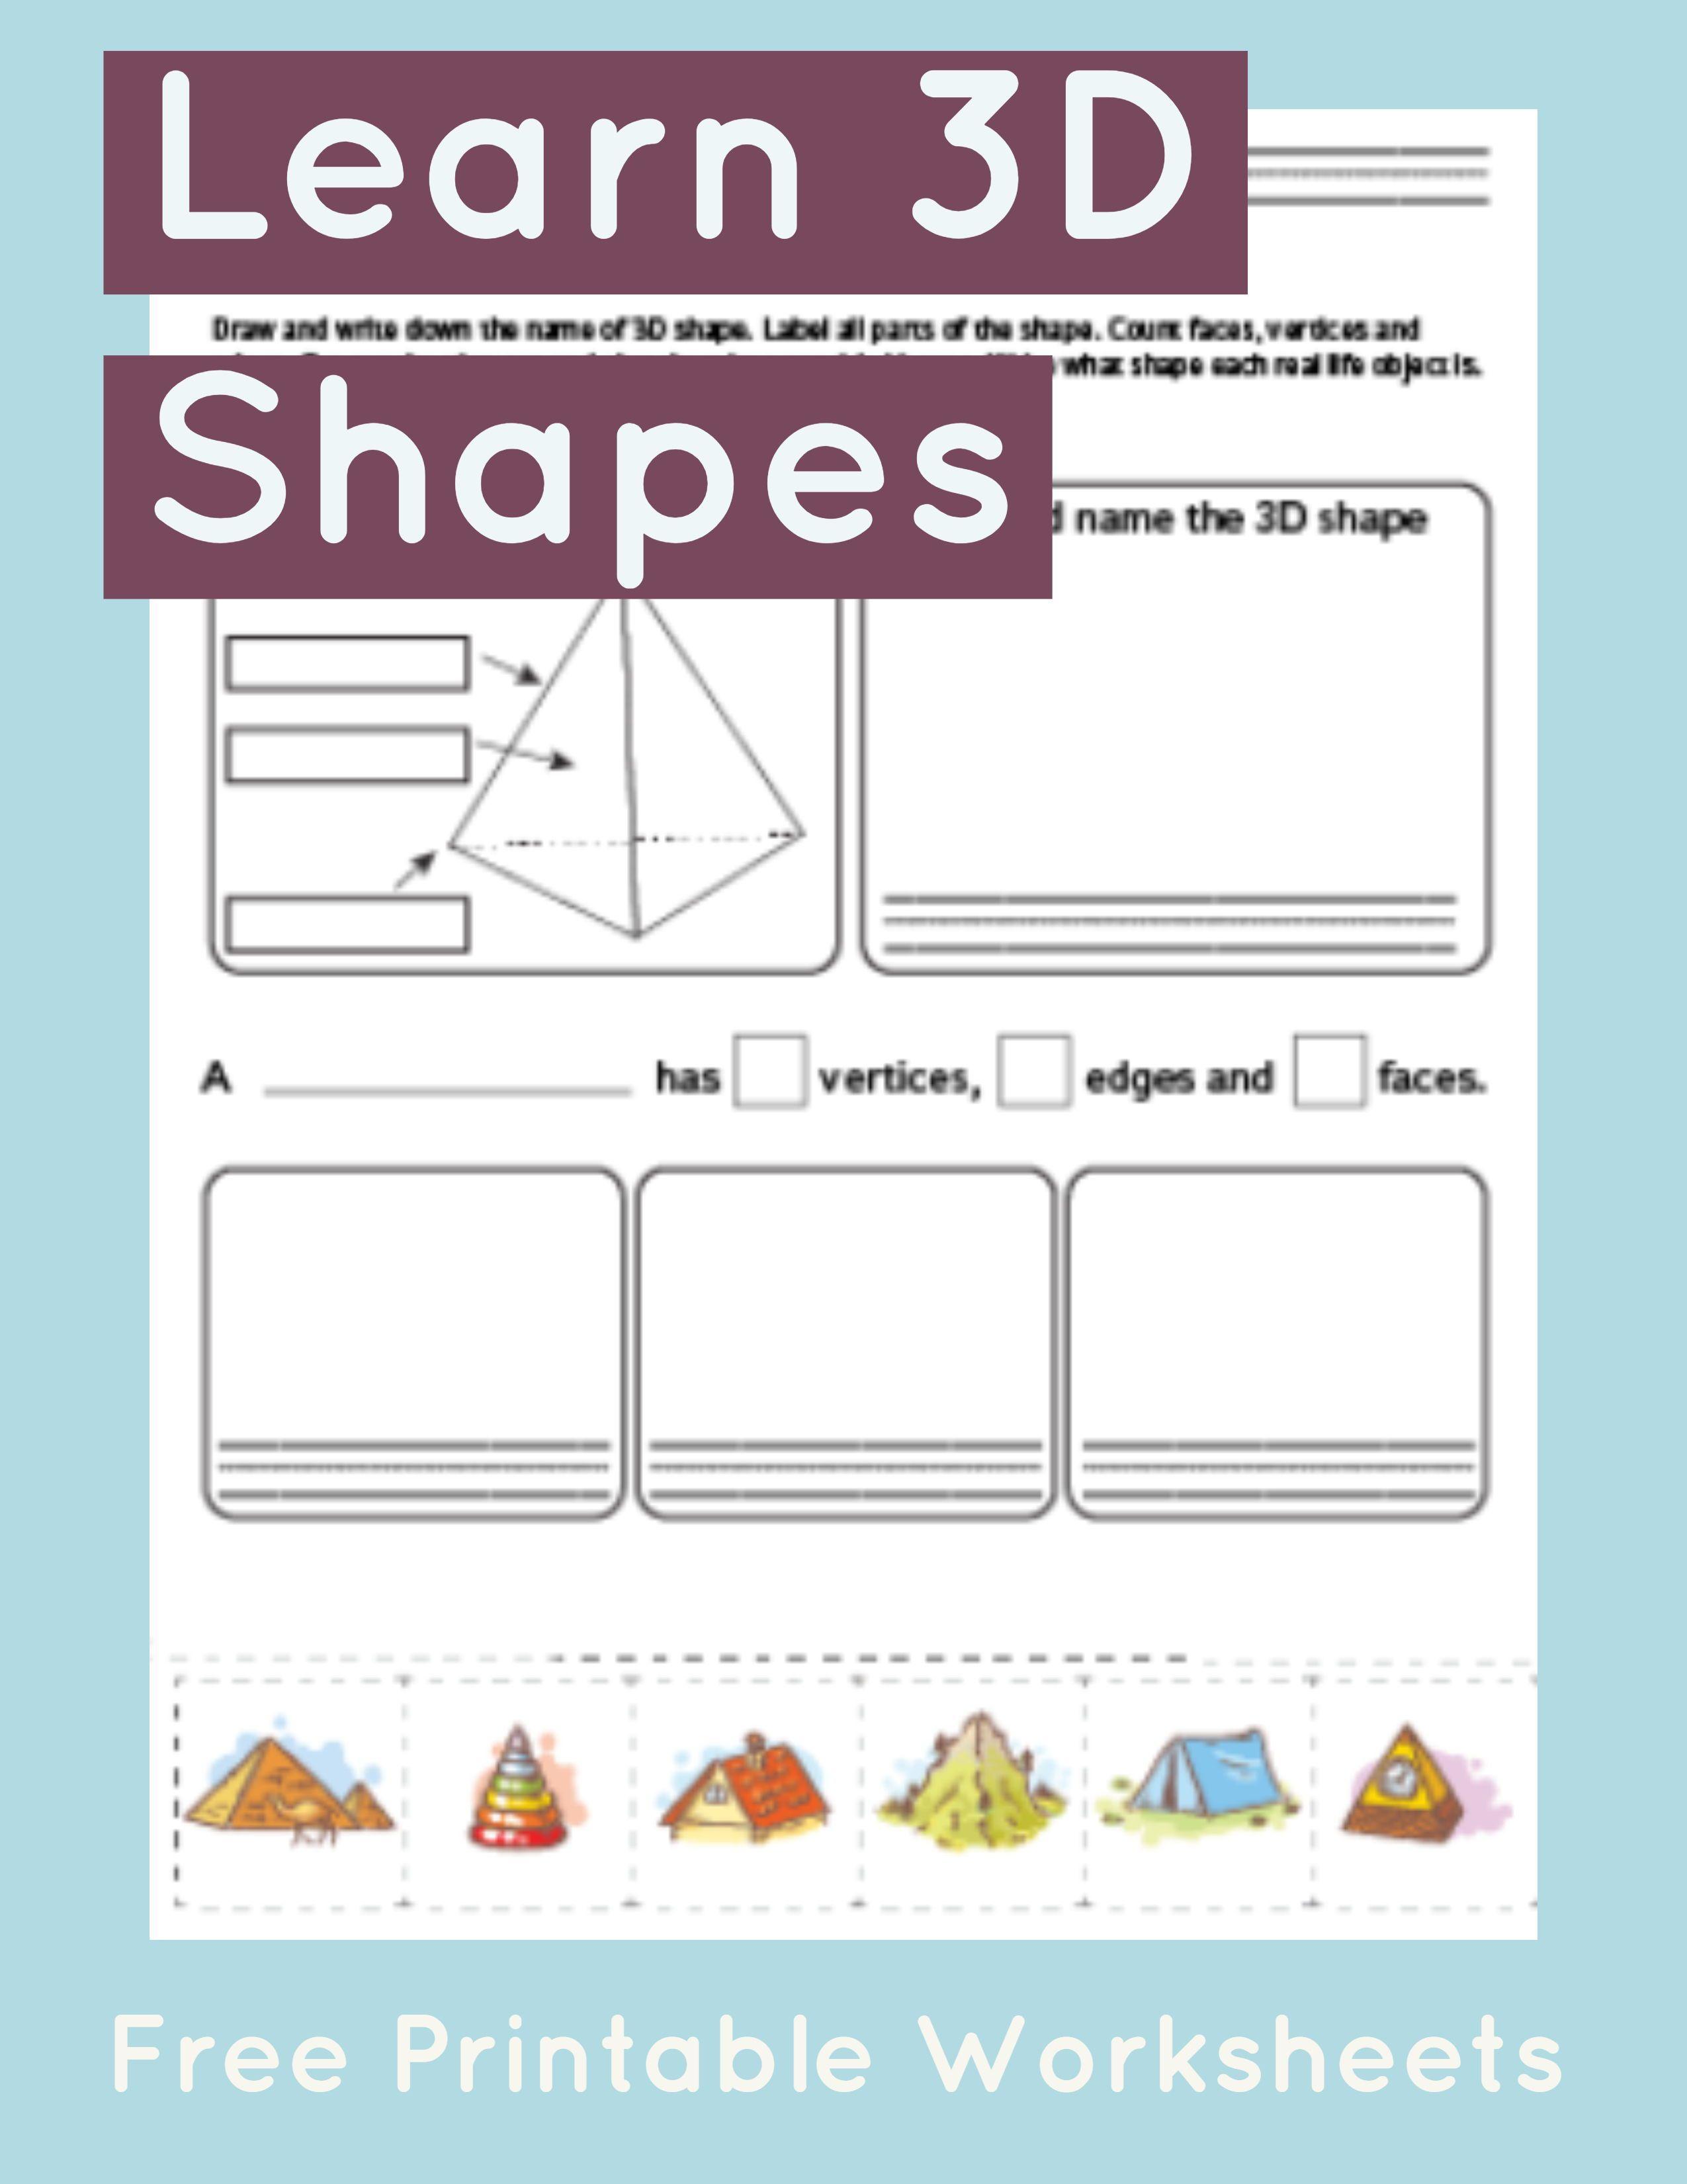 Pyramid Worksheet Primarylearning Org Shapes Worksheet Kindergarten Math Worksheets Free Math